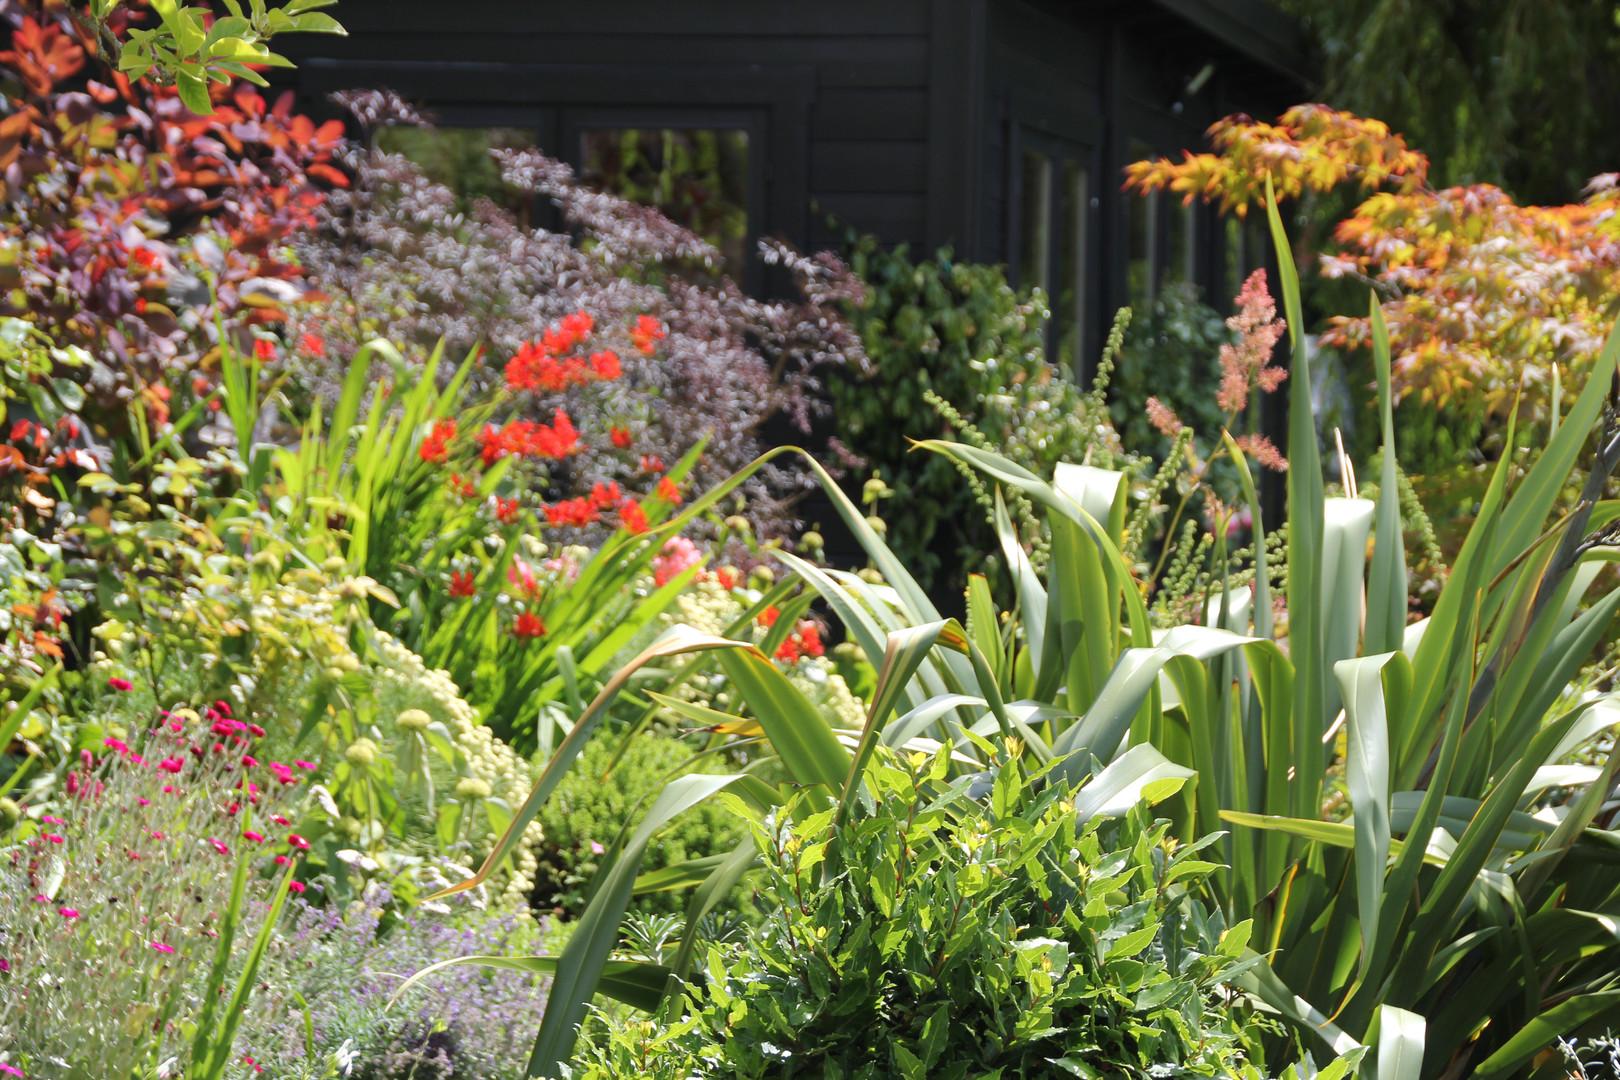 Chrissy's garden